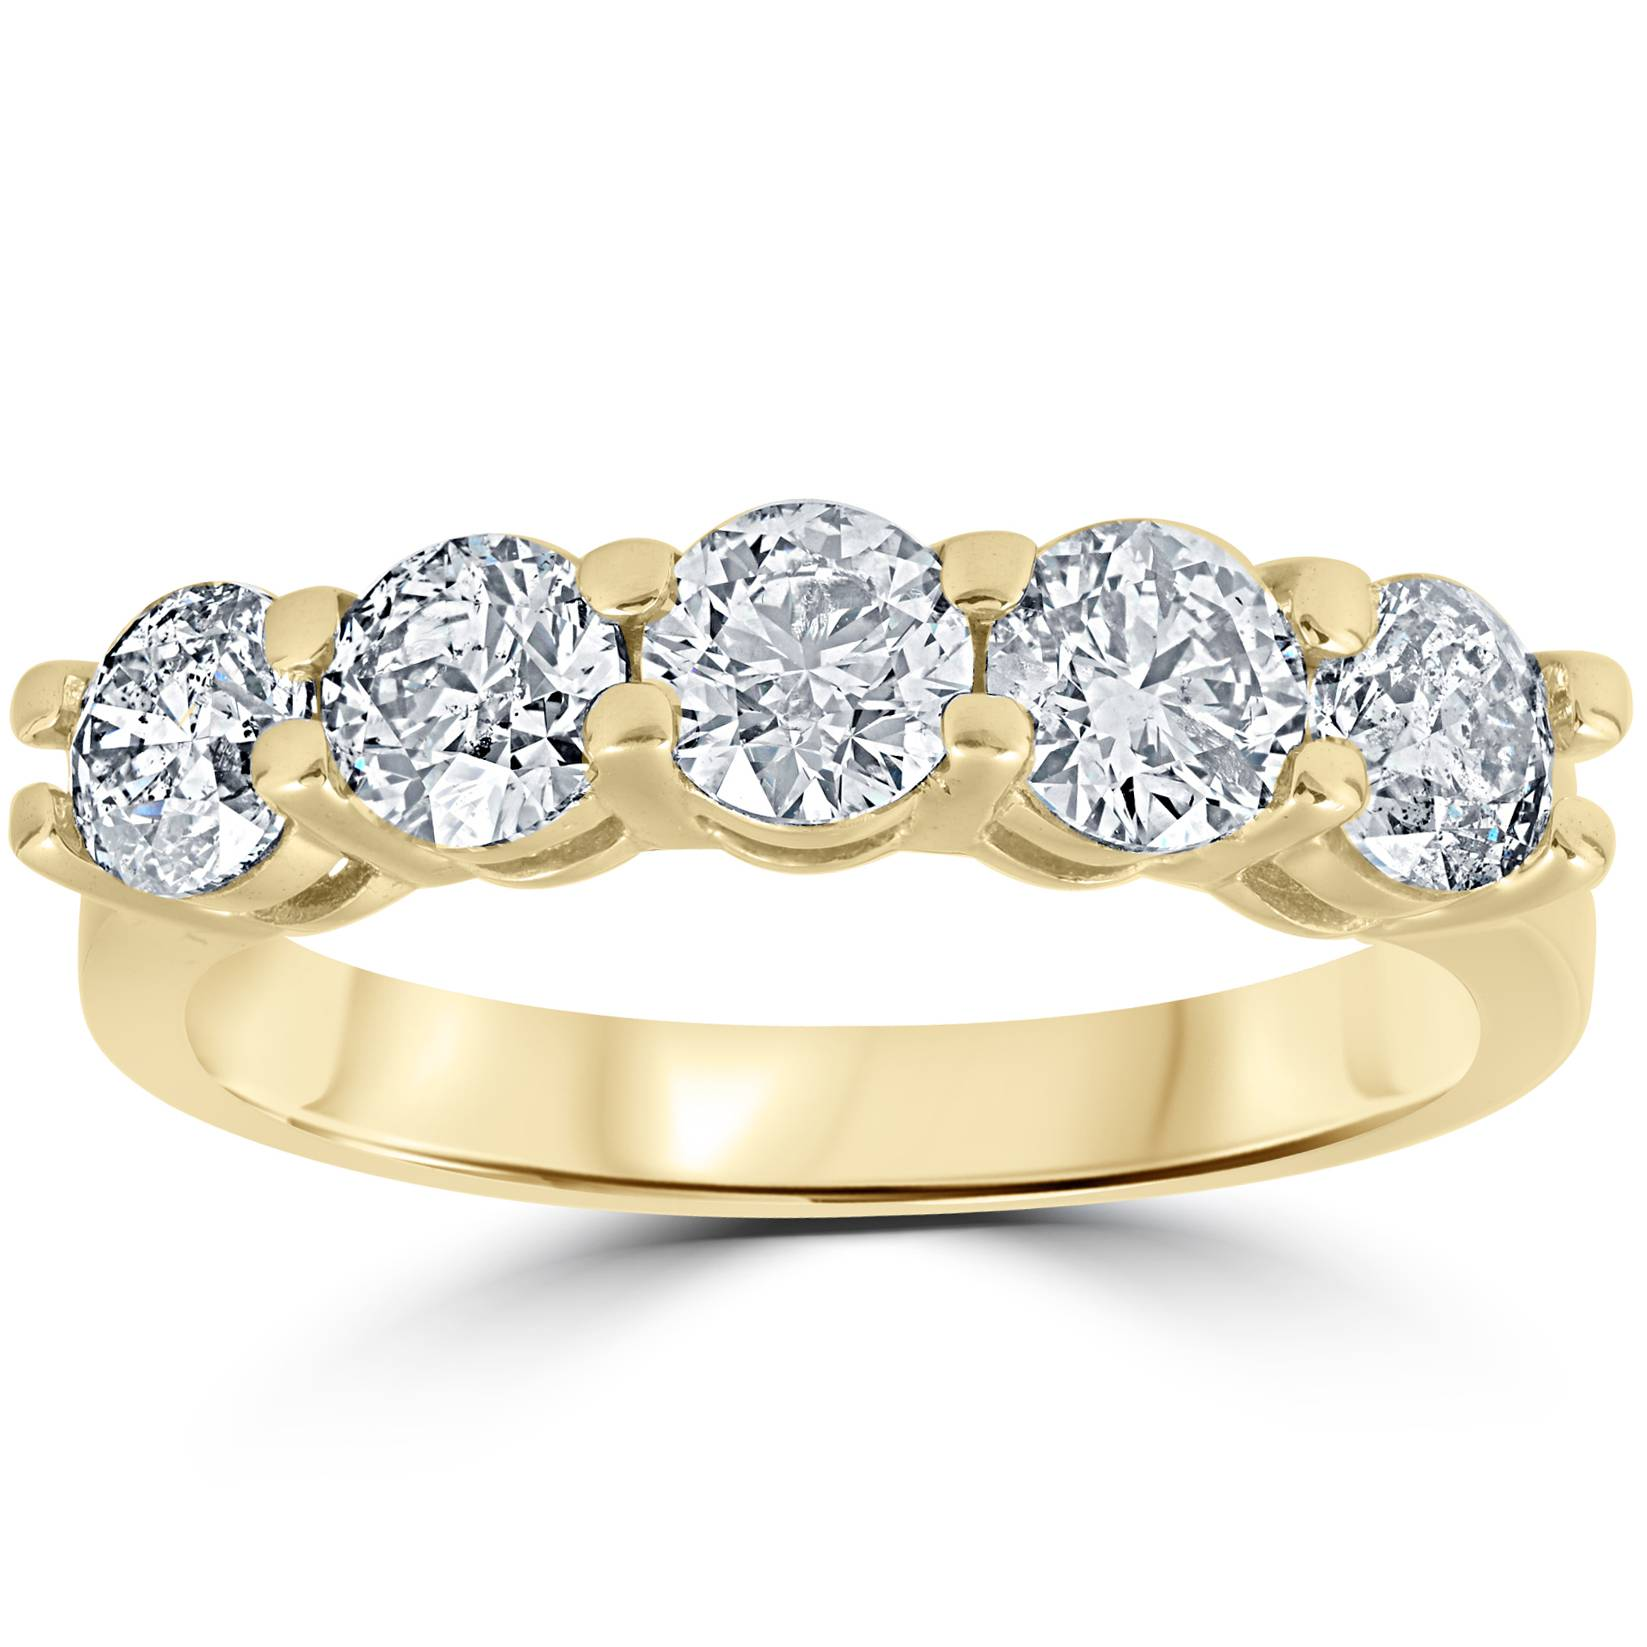 K yellow gold ct round cut diamond five stone wedding